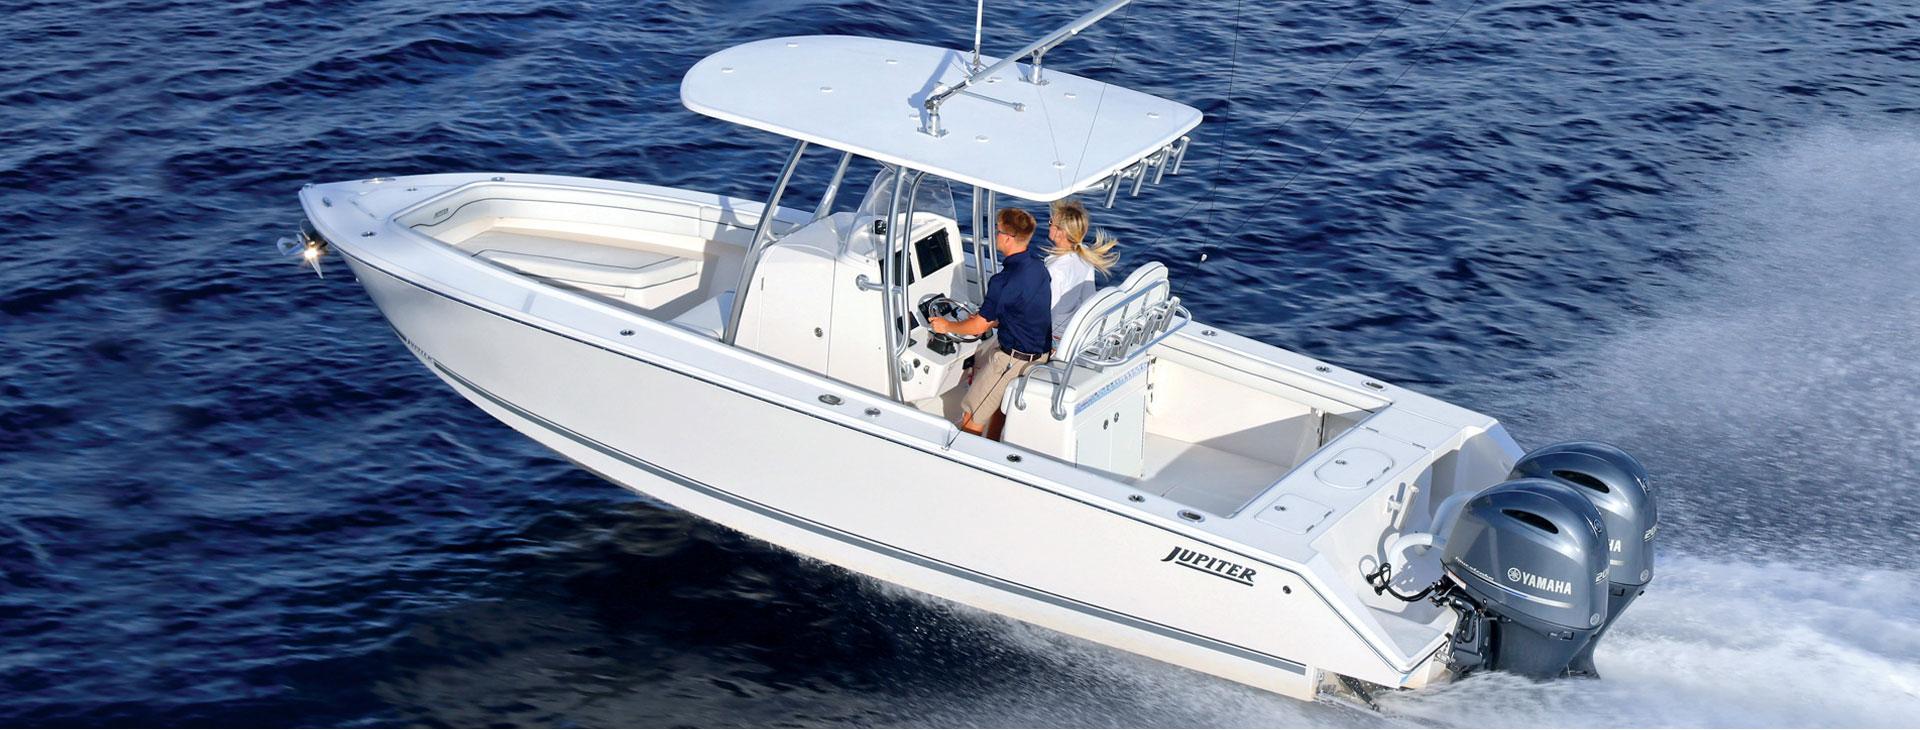 jupiter boat 26fs white